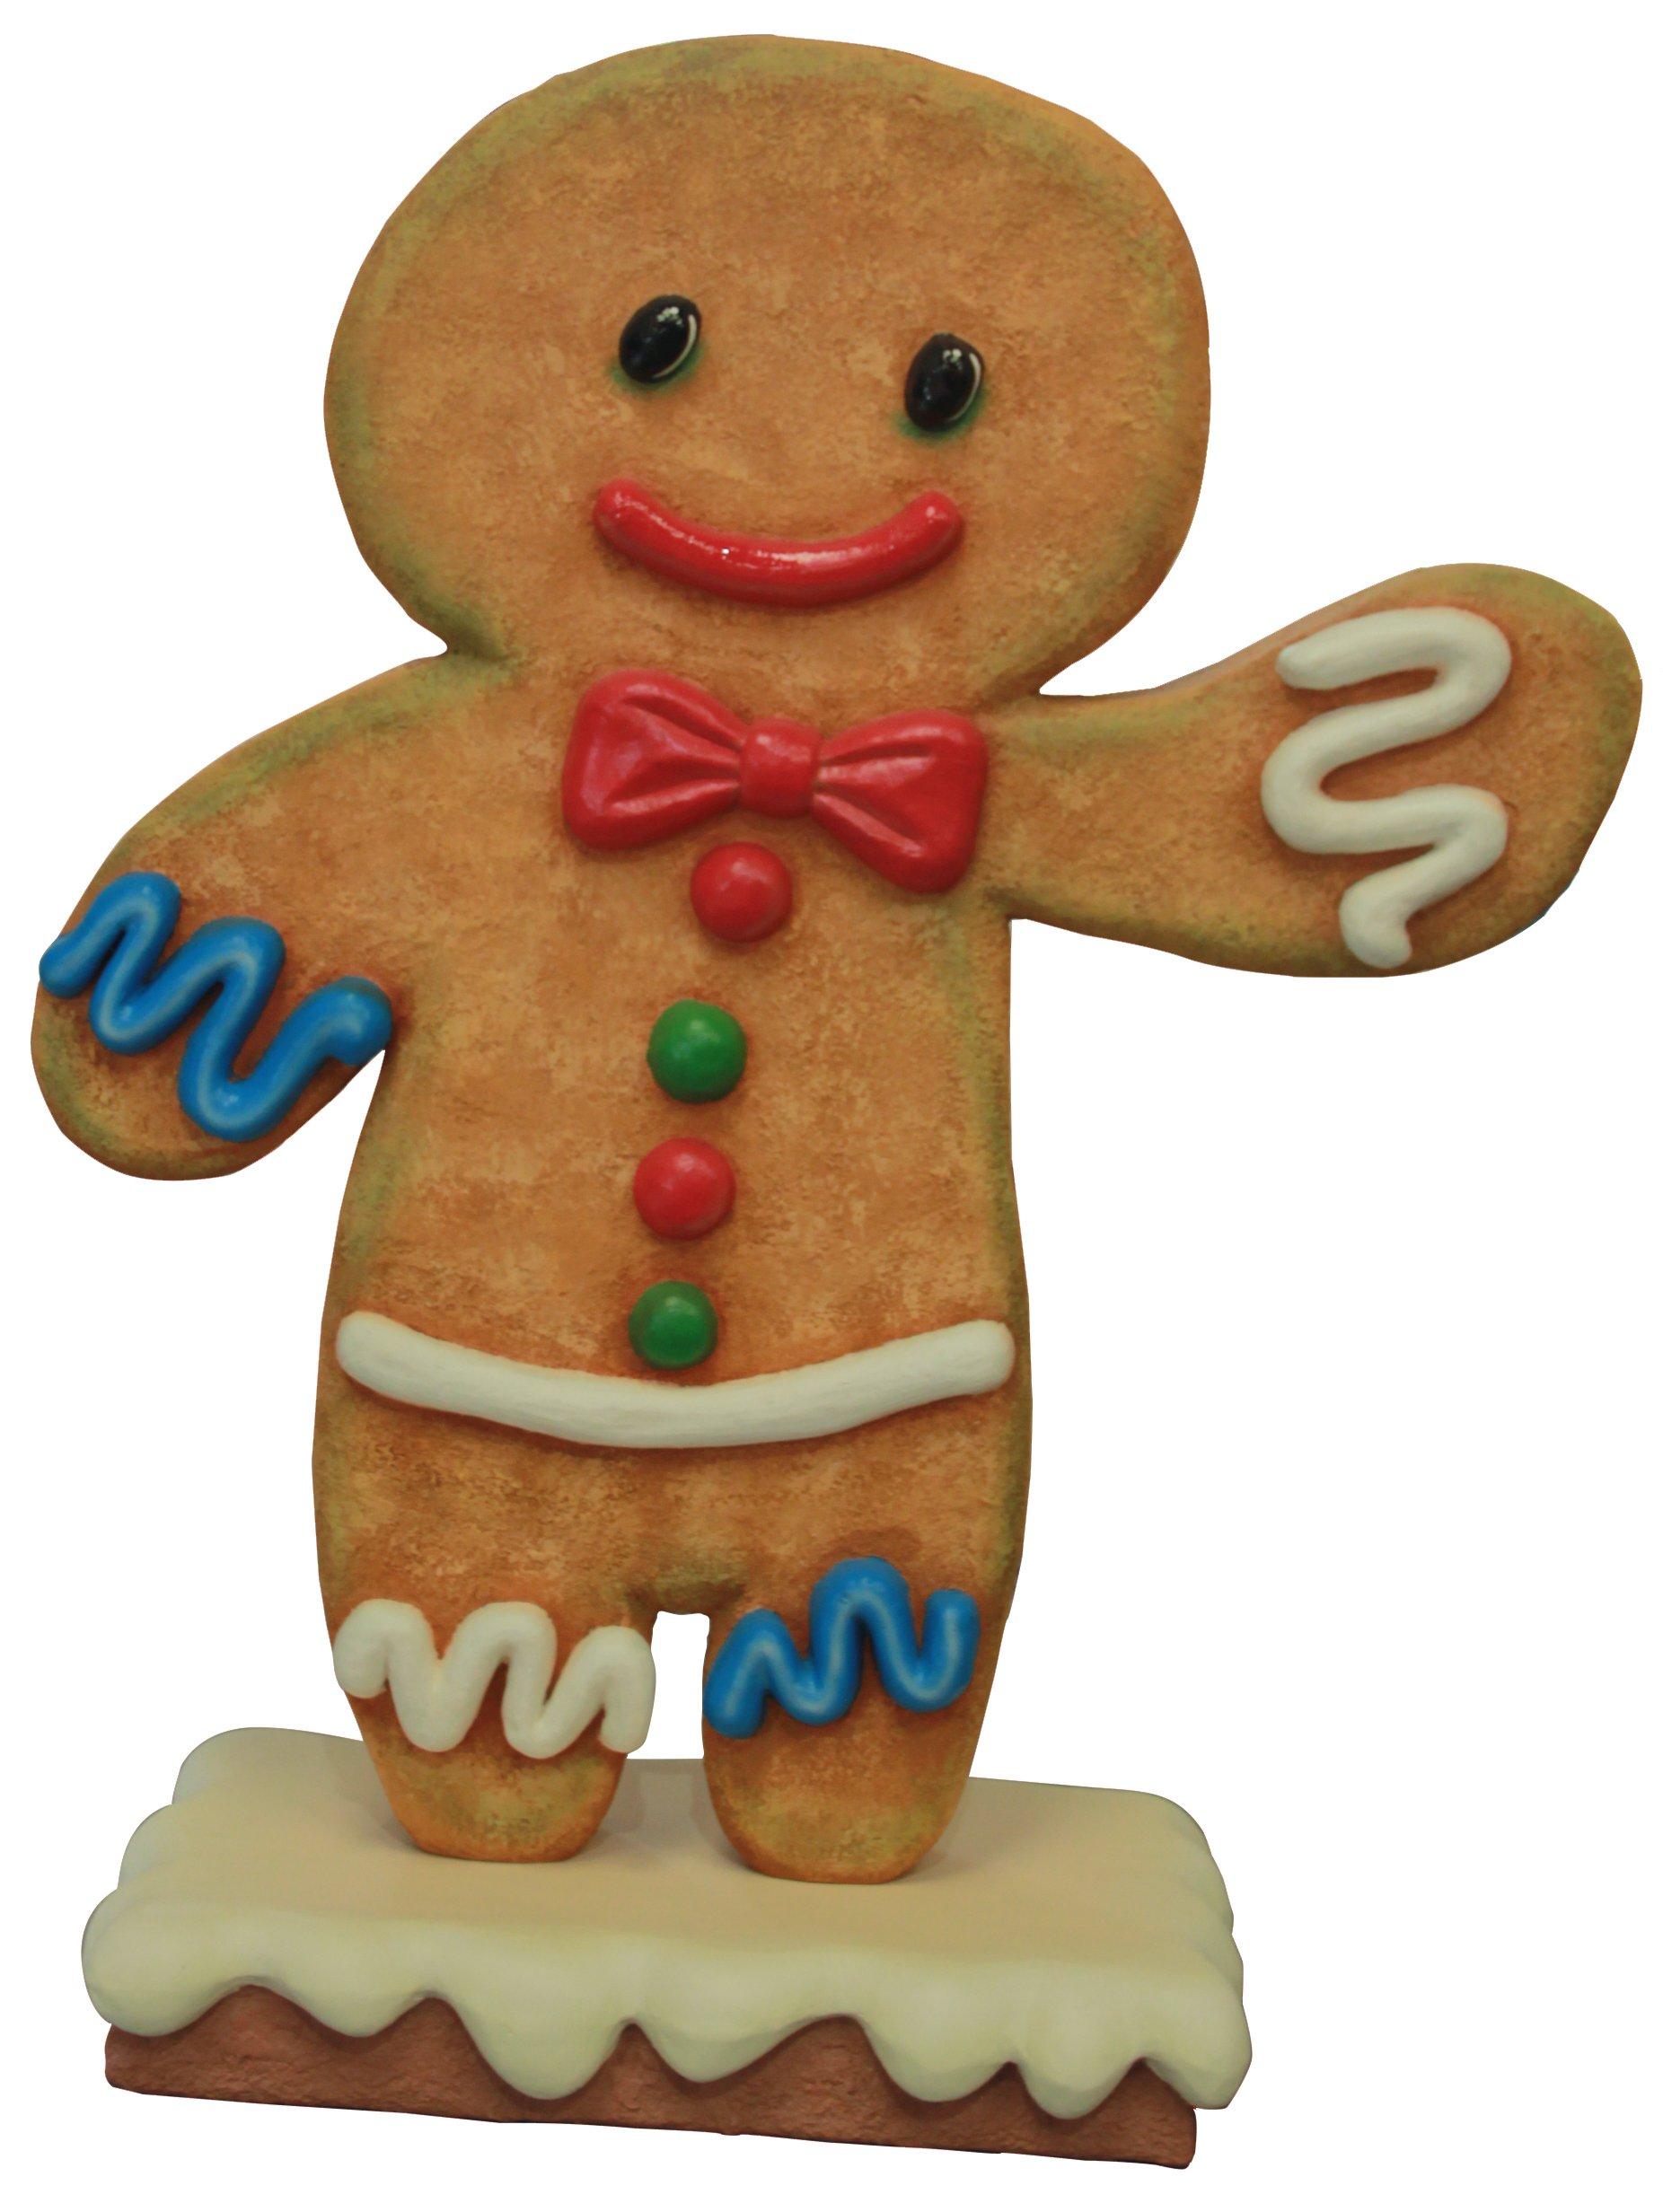 Queens of Christmas WL-GNBR-BOY-3.75 Polyresin Ginger Bread Boy Decorative Figurine, 45''